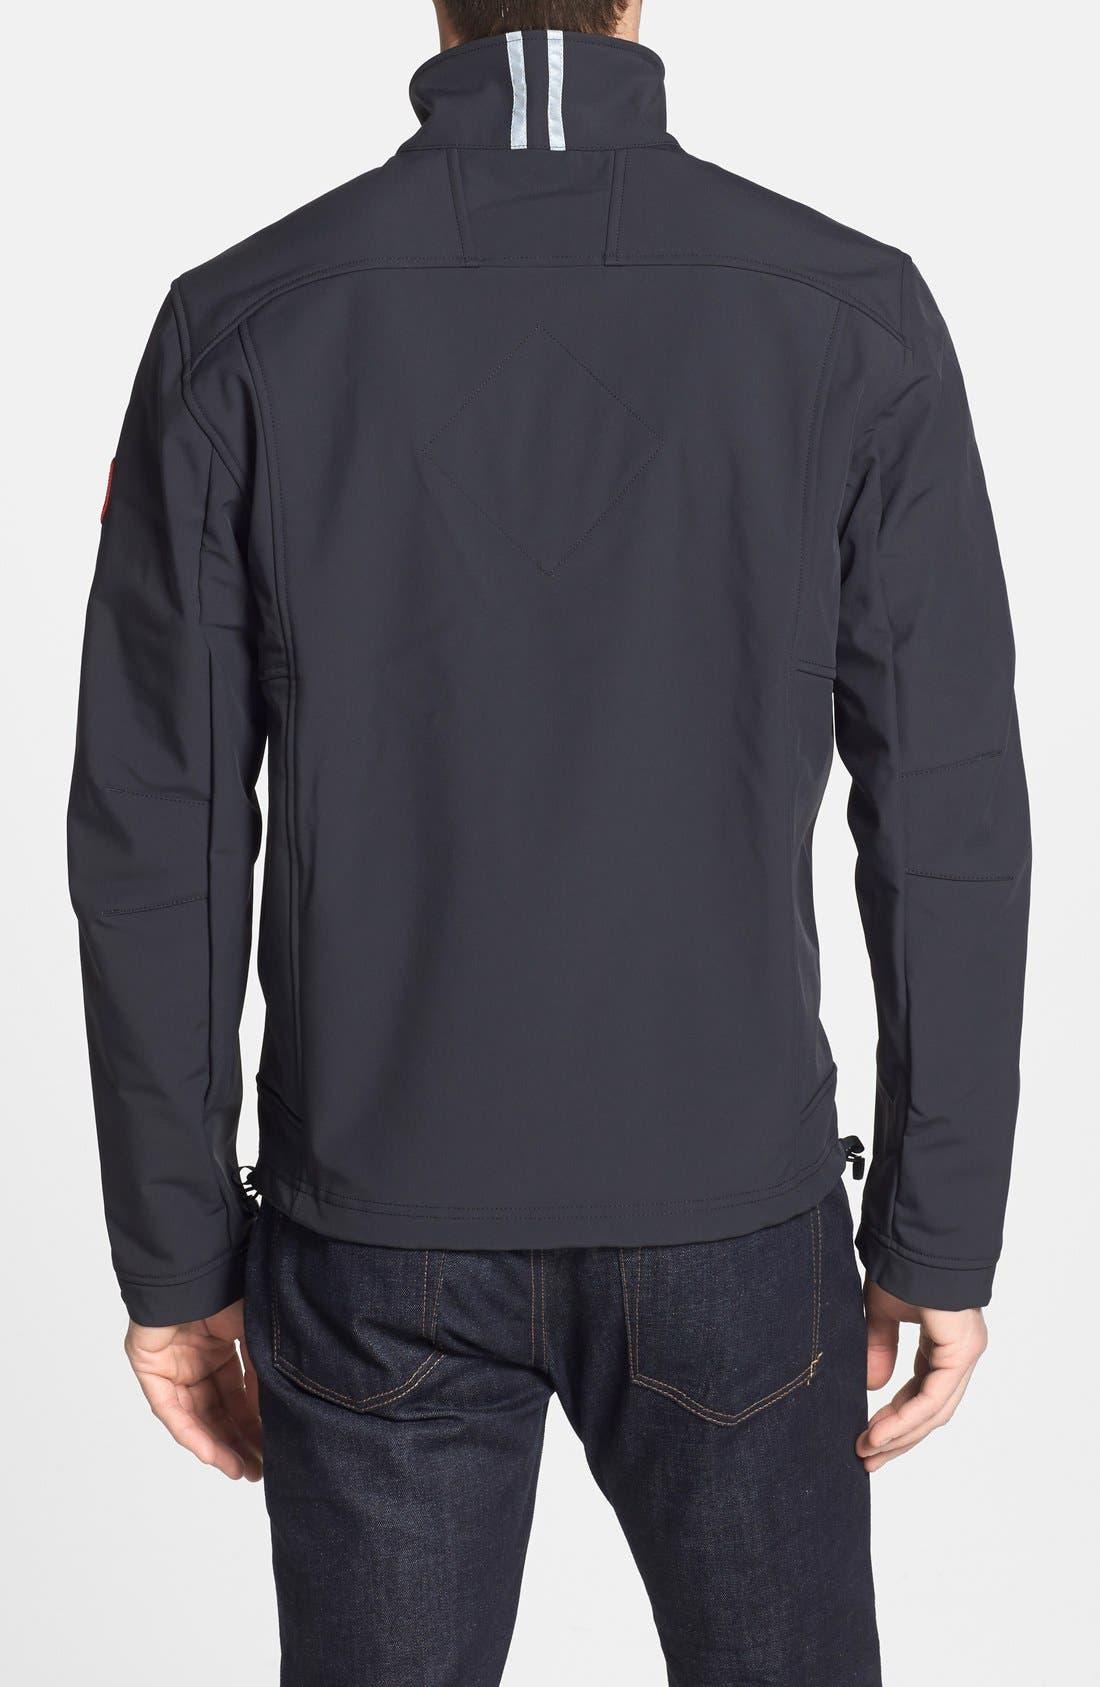 'Bracebridge' Water Resistant Jacket,                             Alternate thumbnail 3, color,                             001